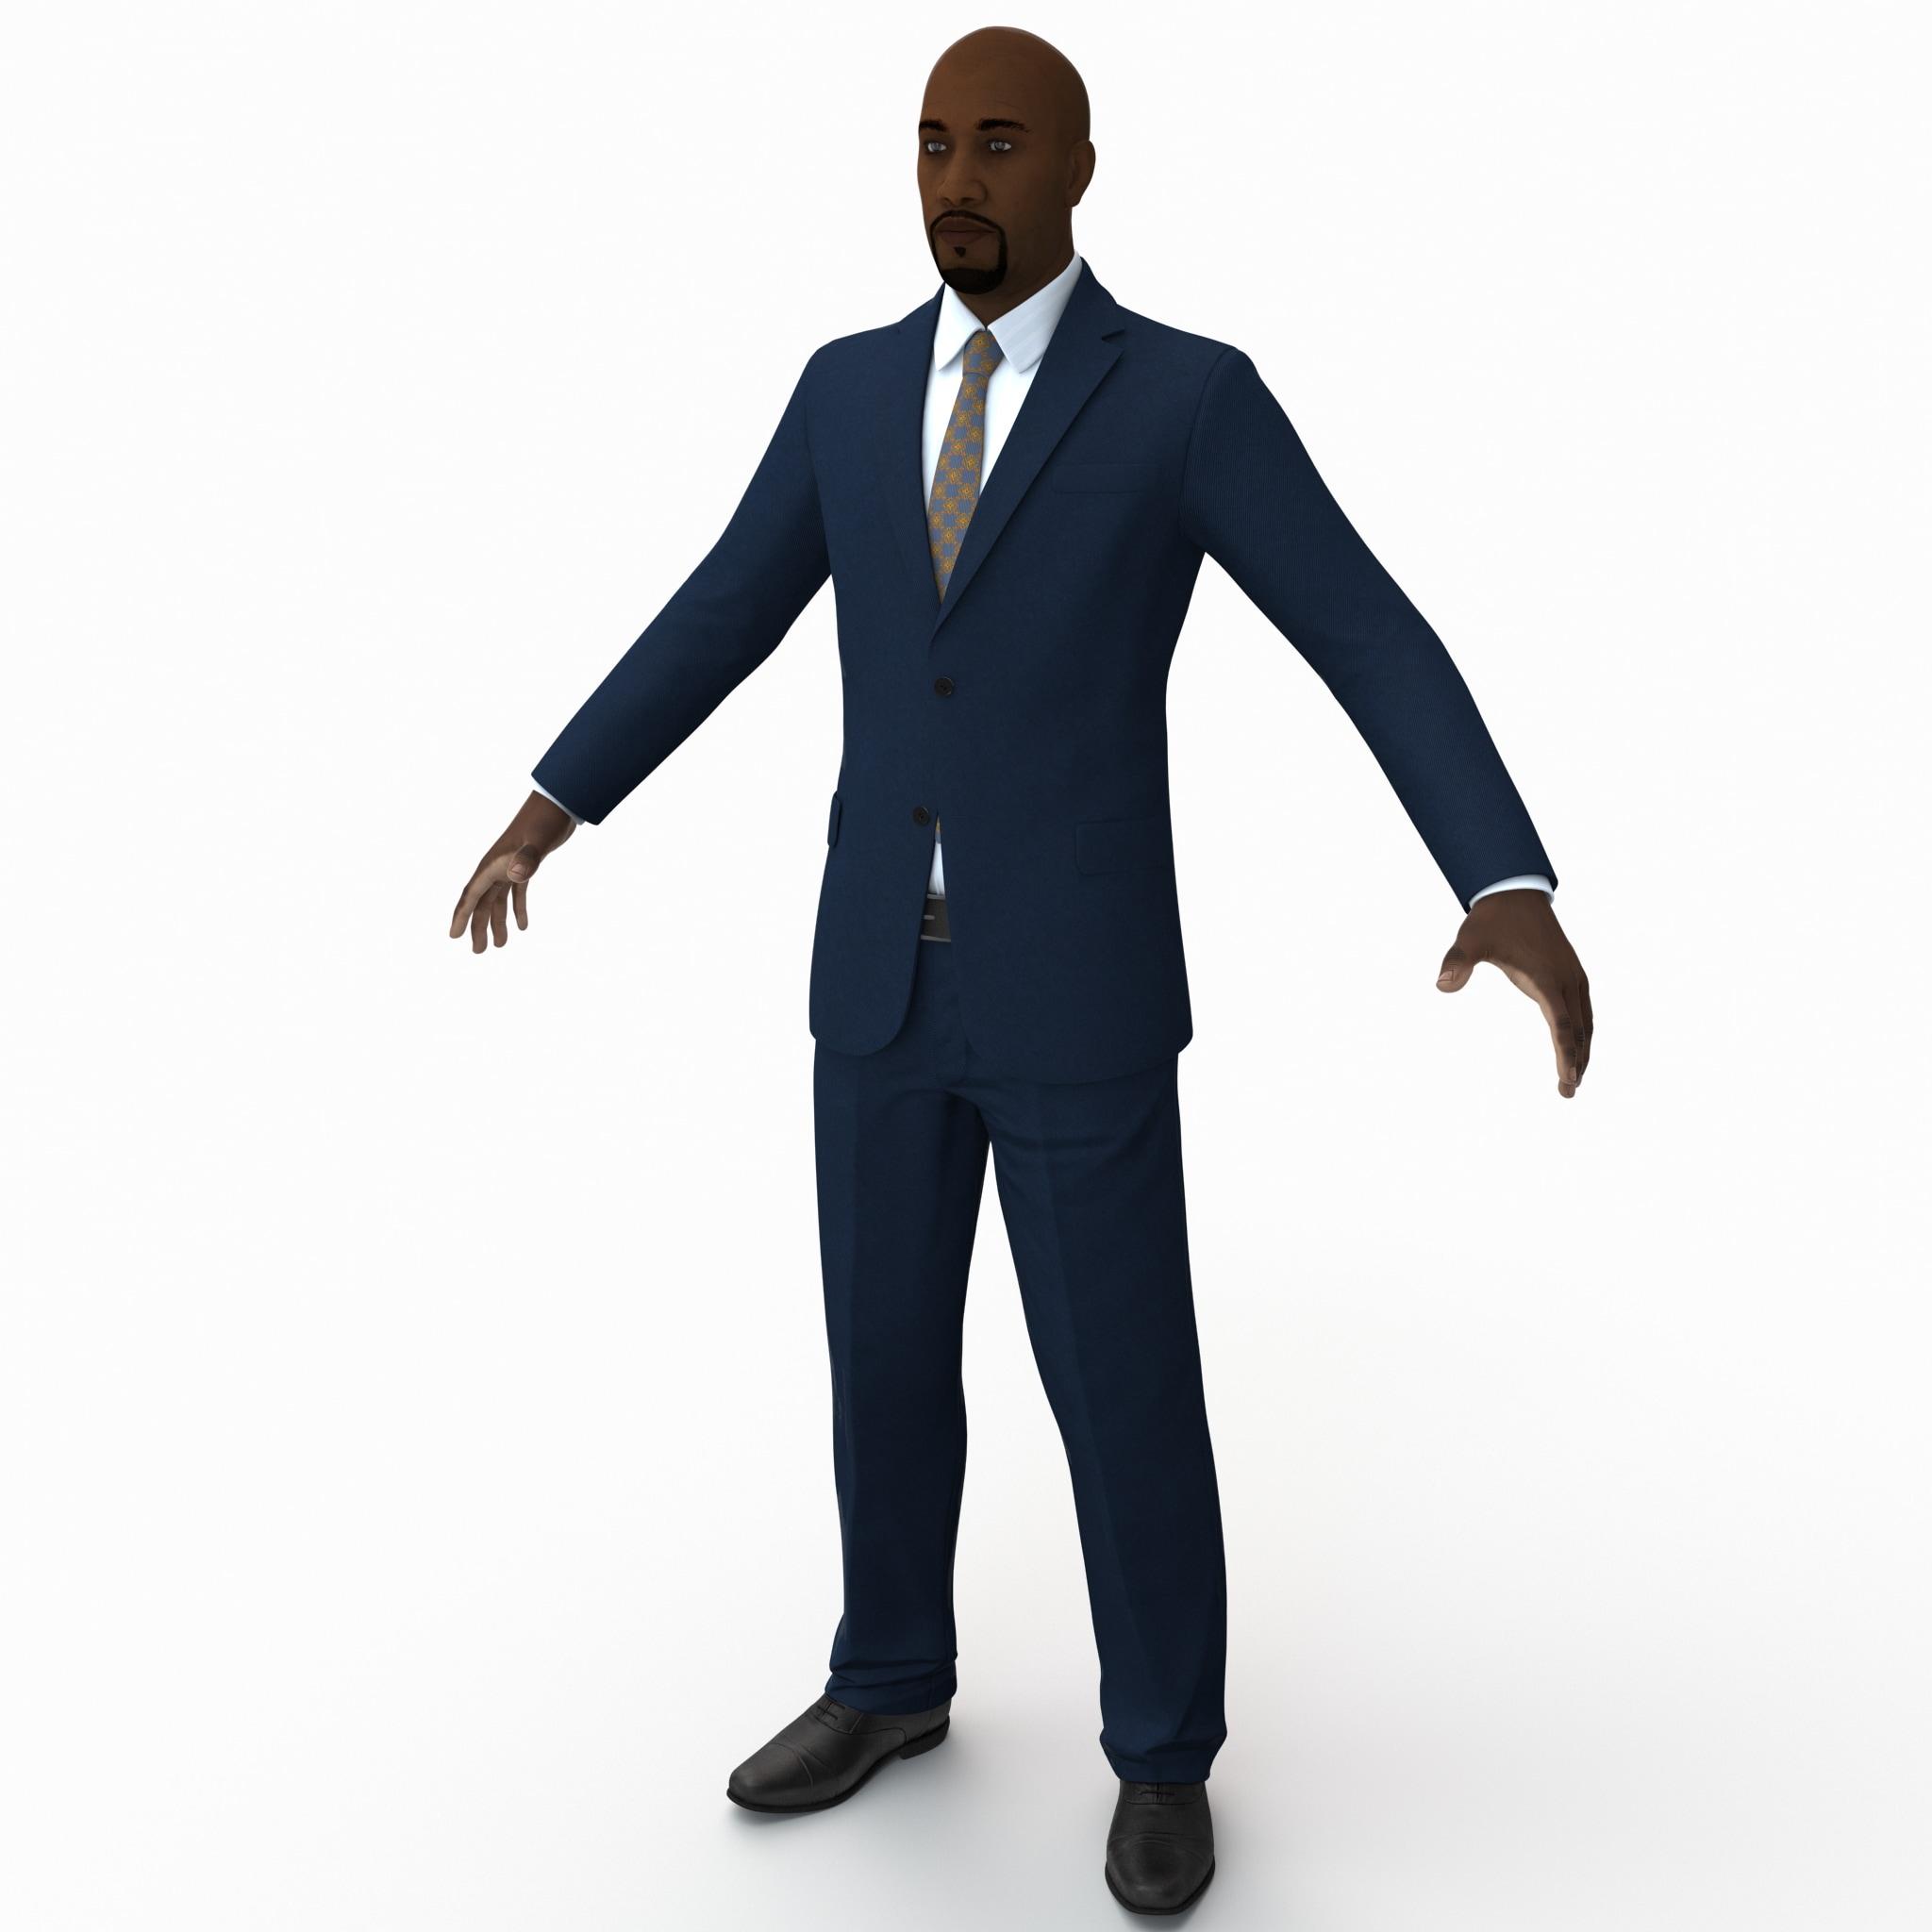 Black Male Businessman_2.jpg